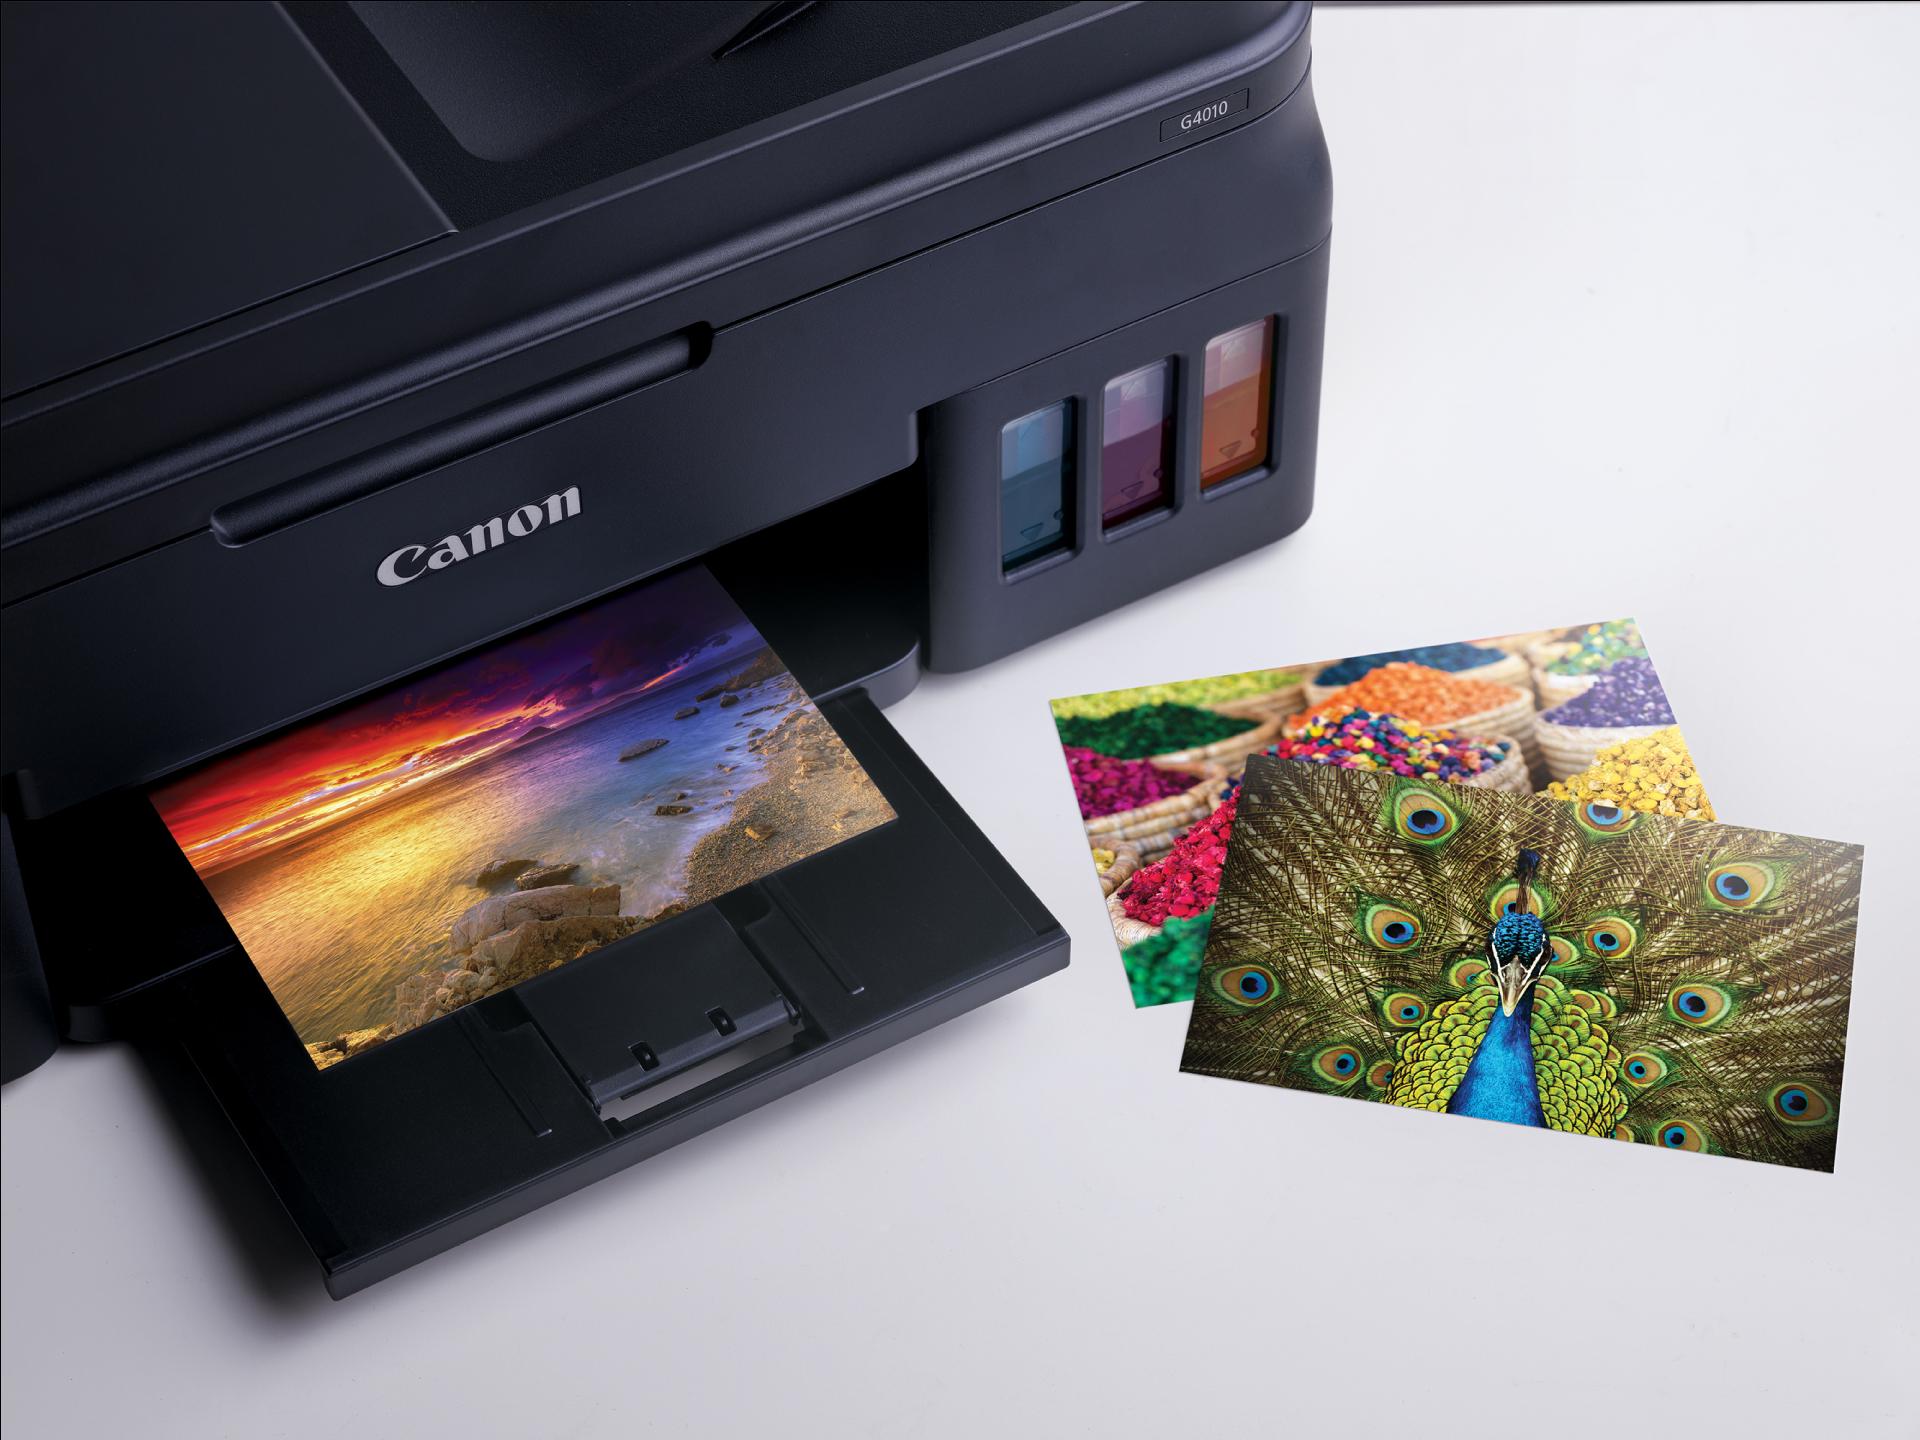 Supports Borderless Printing